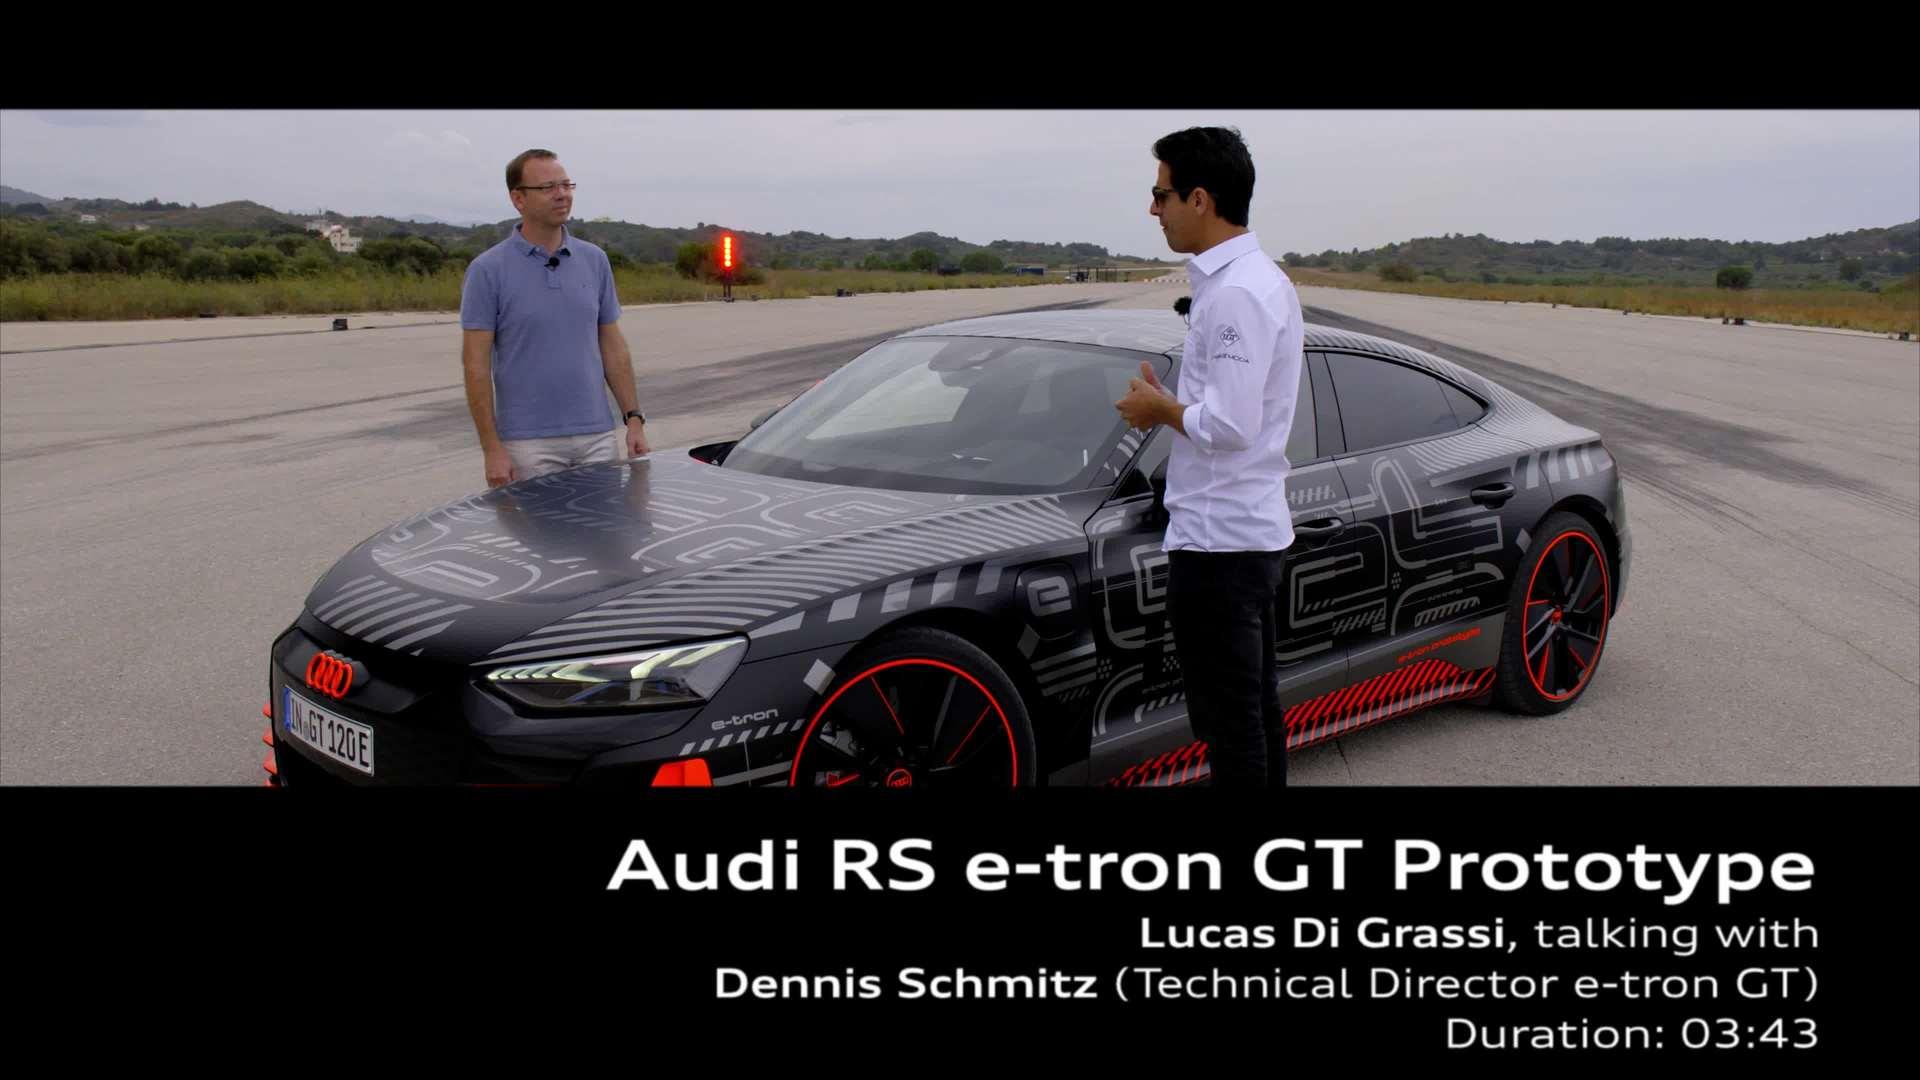 Lucas Di Grassi and Dennis Schmitz about the Audi RS e-tron GT Prototype